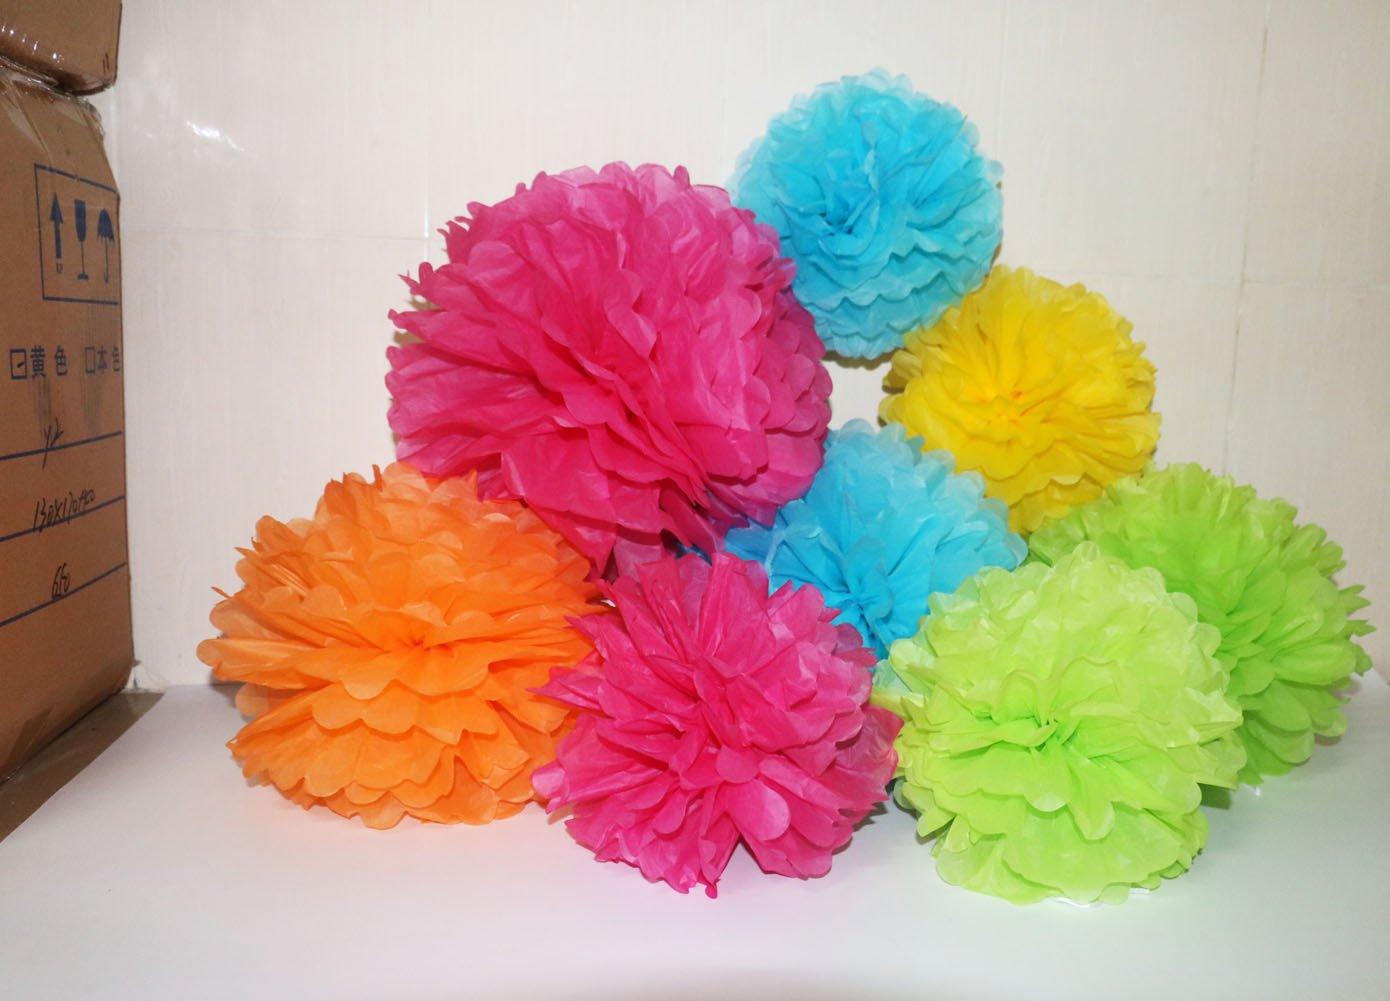 Amazon Sookoo 15 Pcs Paper Pom Poms In 14 Inch 12 Inch 10